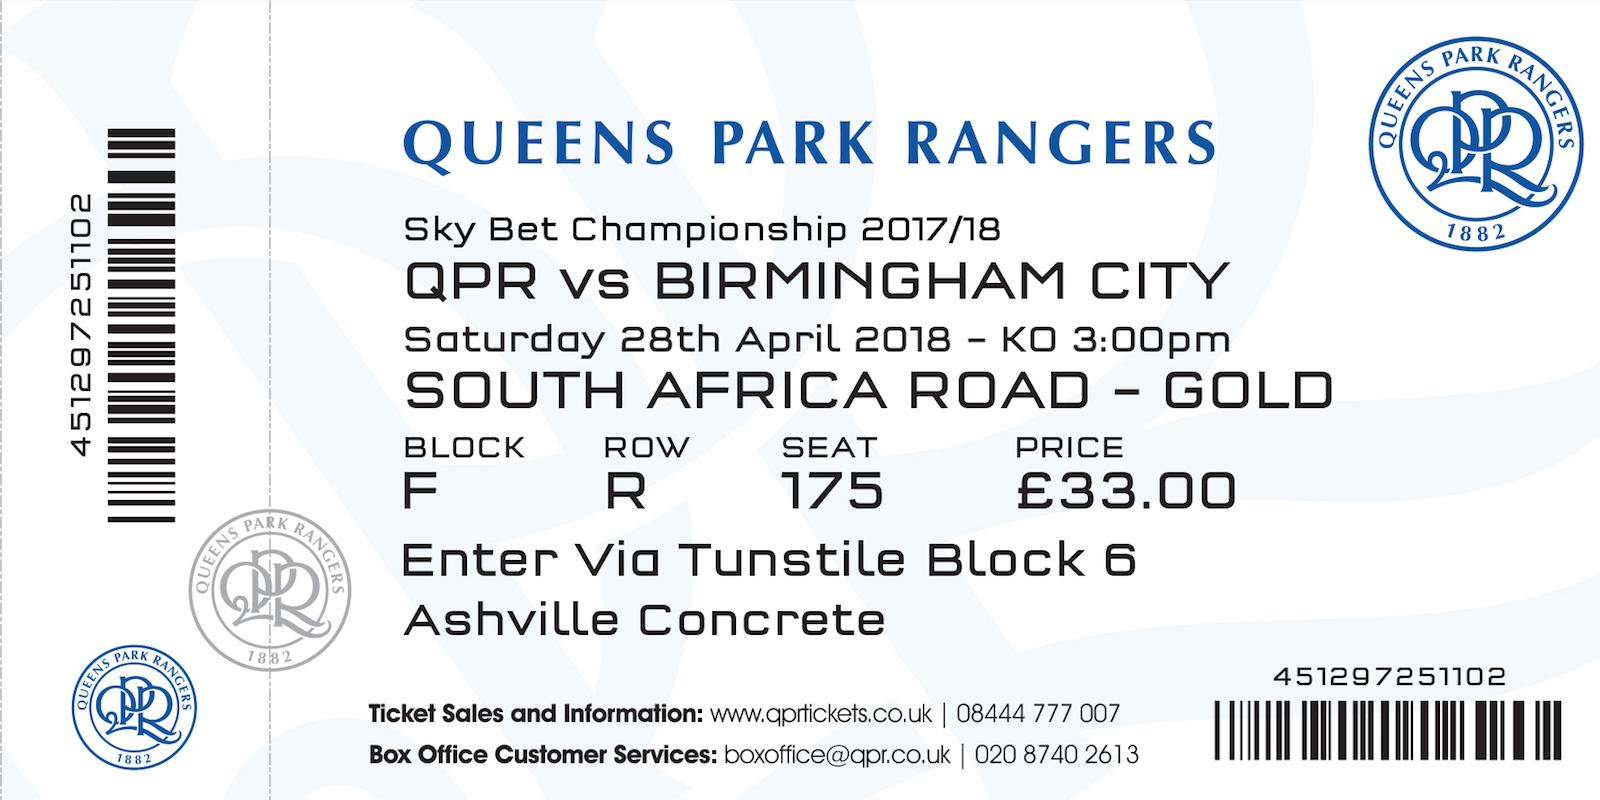 Win two ticket to QPR vs Birmingham City!